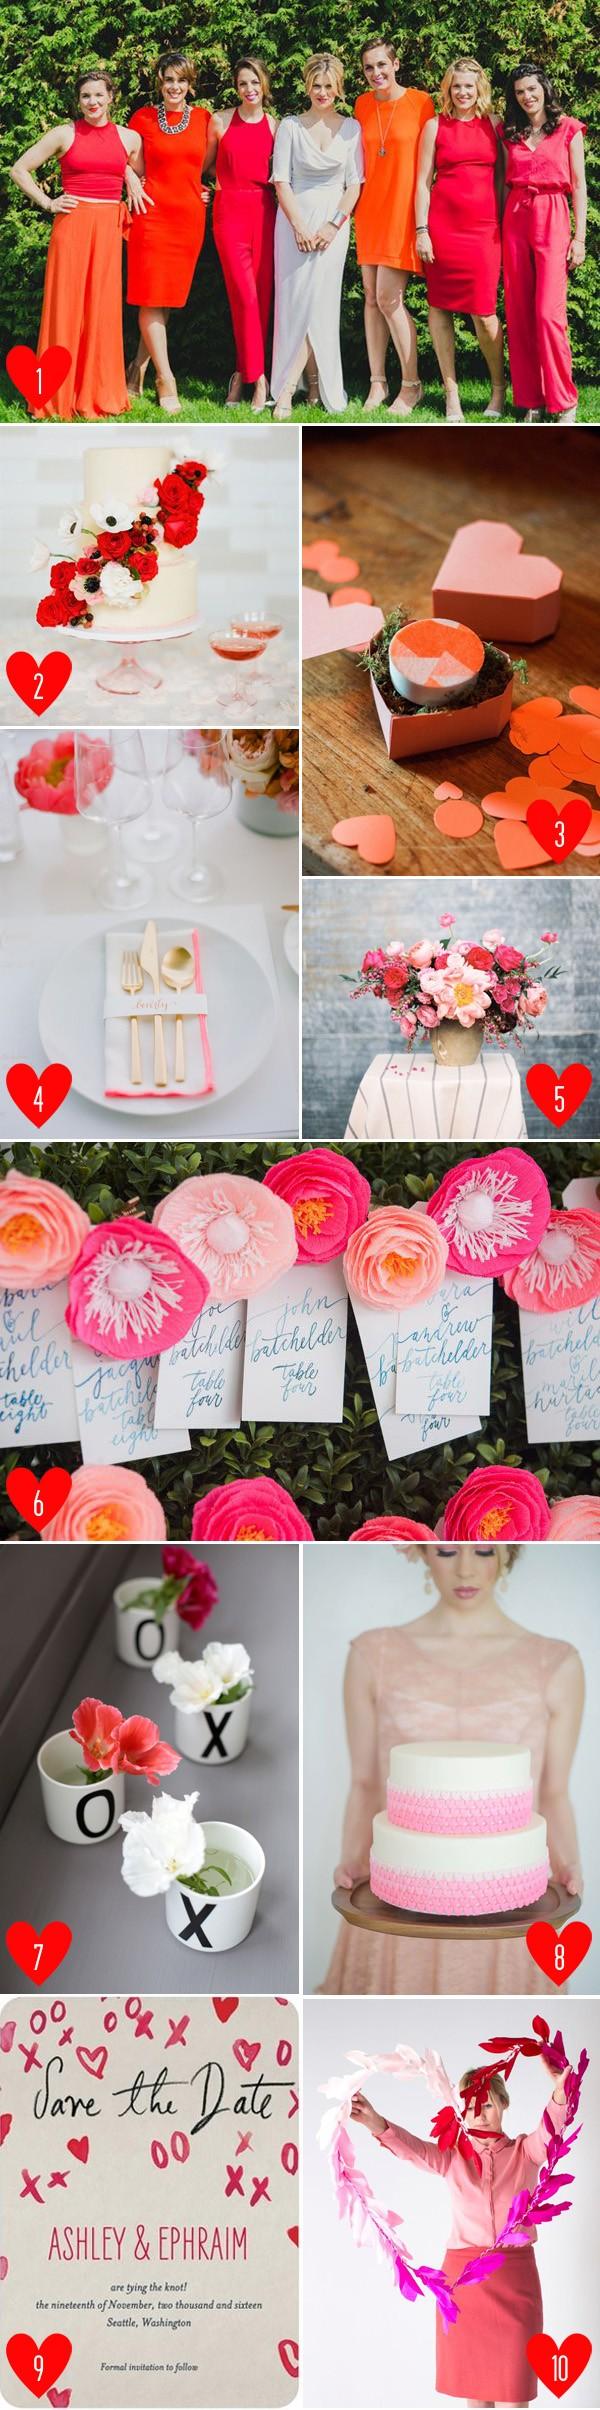 valentines day inspiration 4